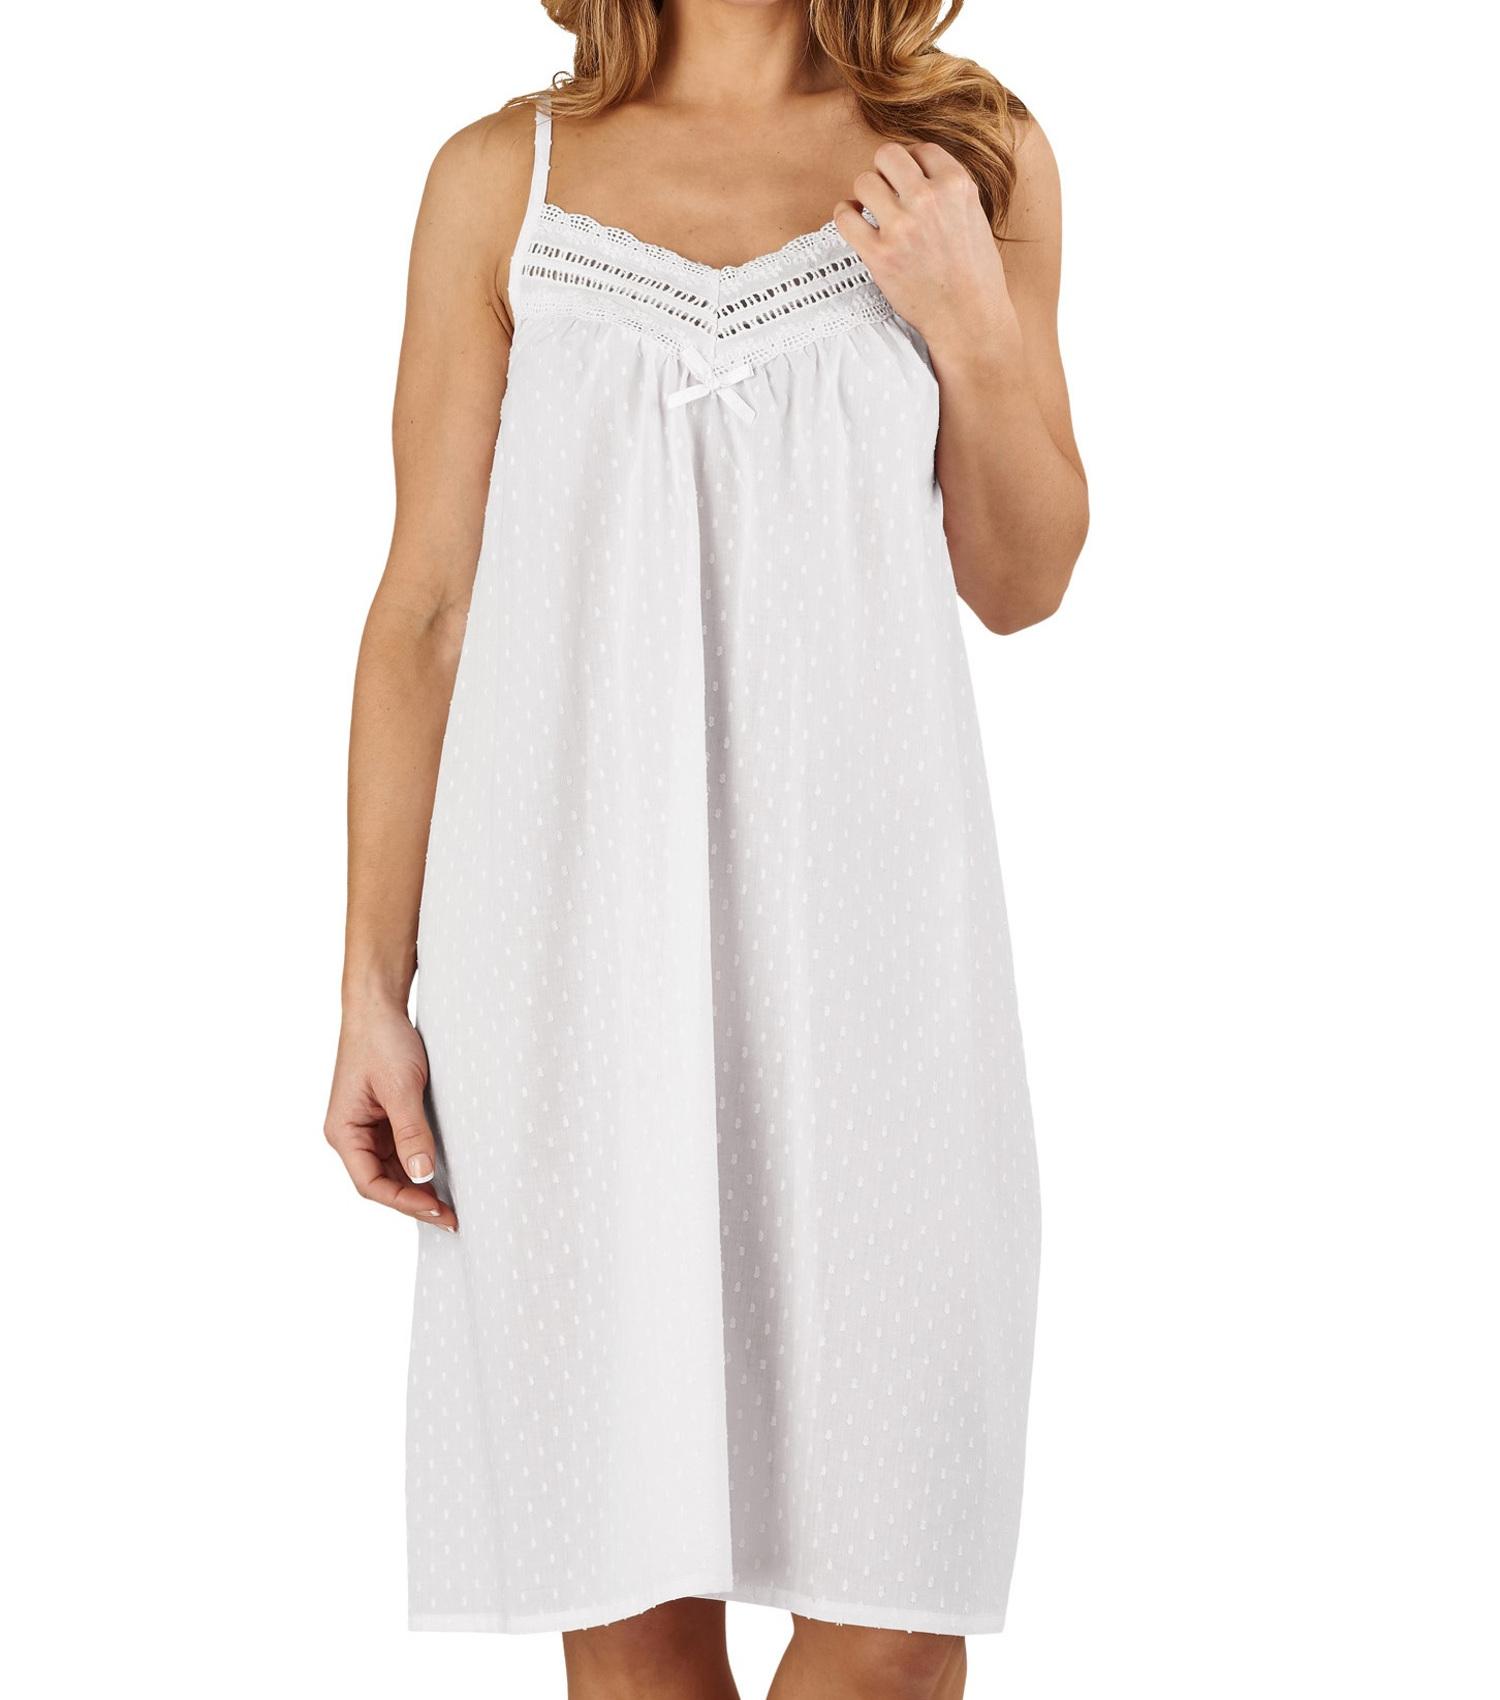 Ladies Womens Cotton Nightgown Nightwear Sleepwear Chemise Nightdress UK 12-20